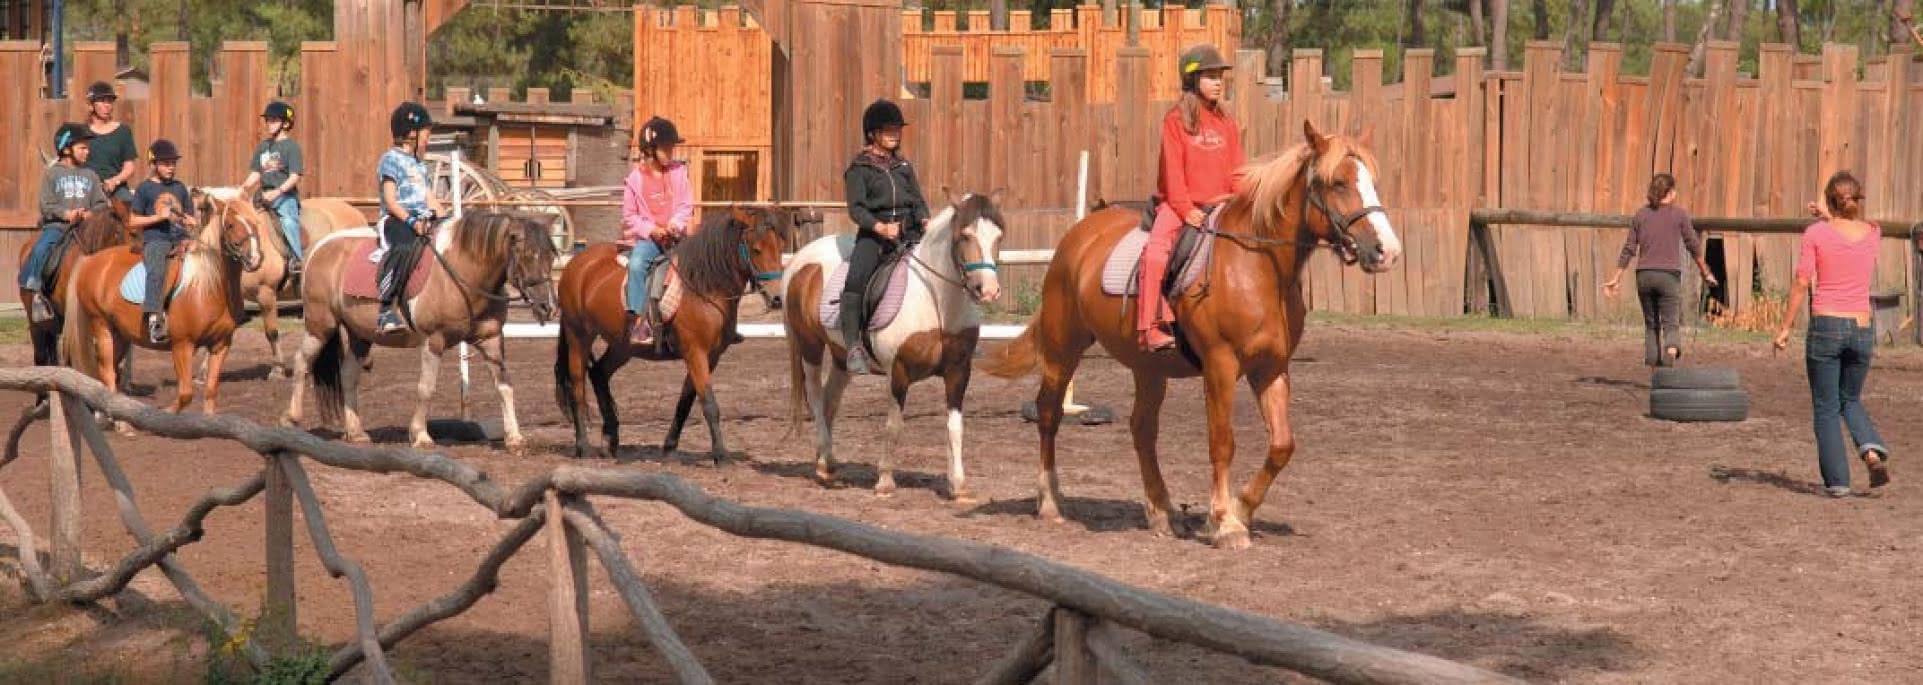 Equitation plaisir 27